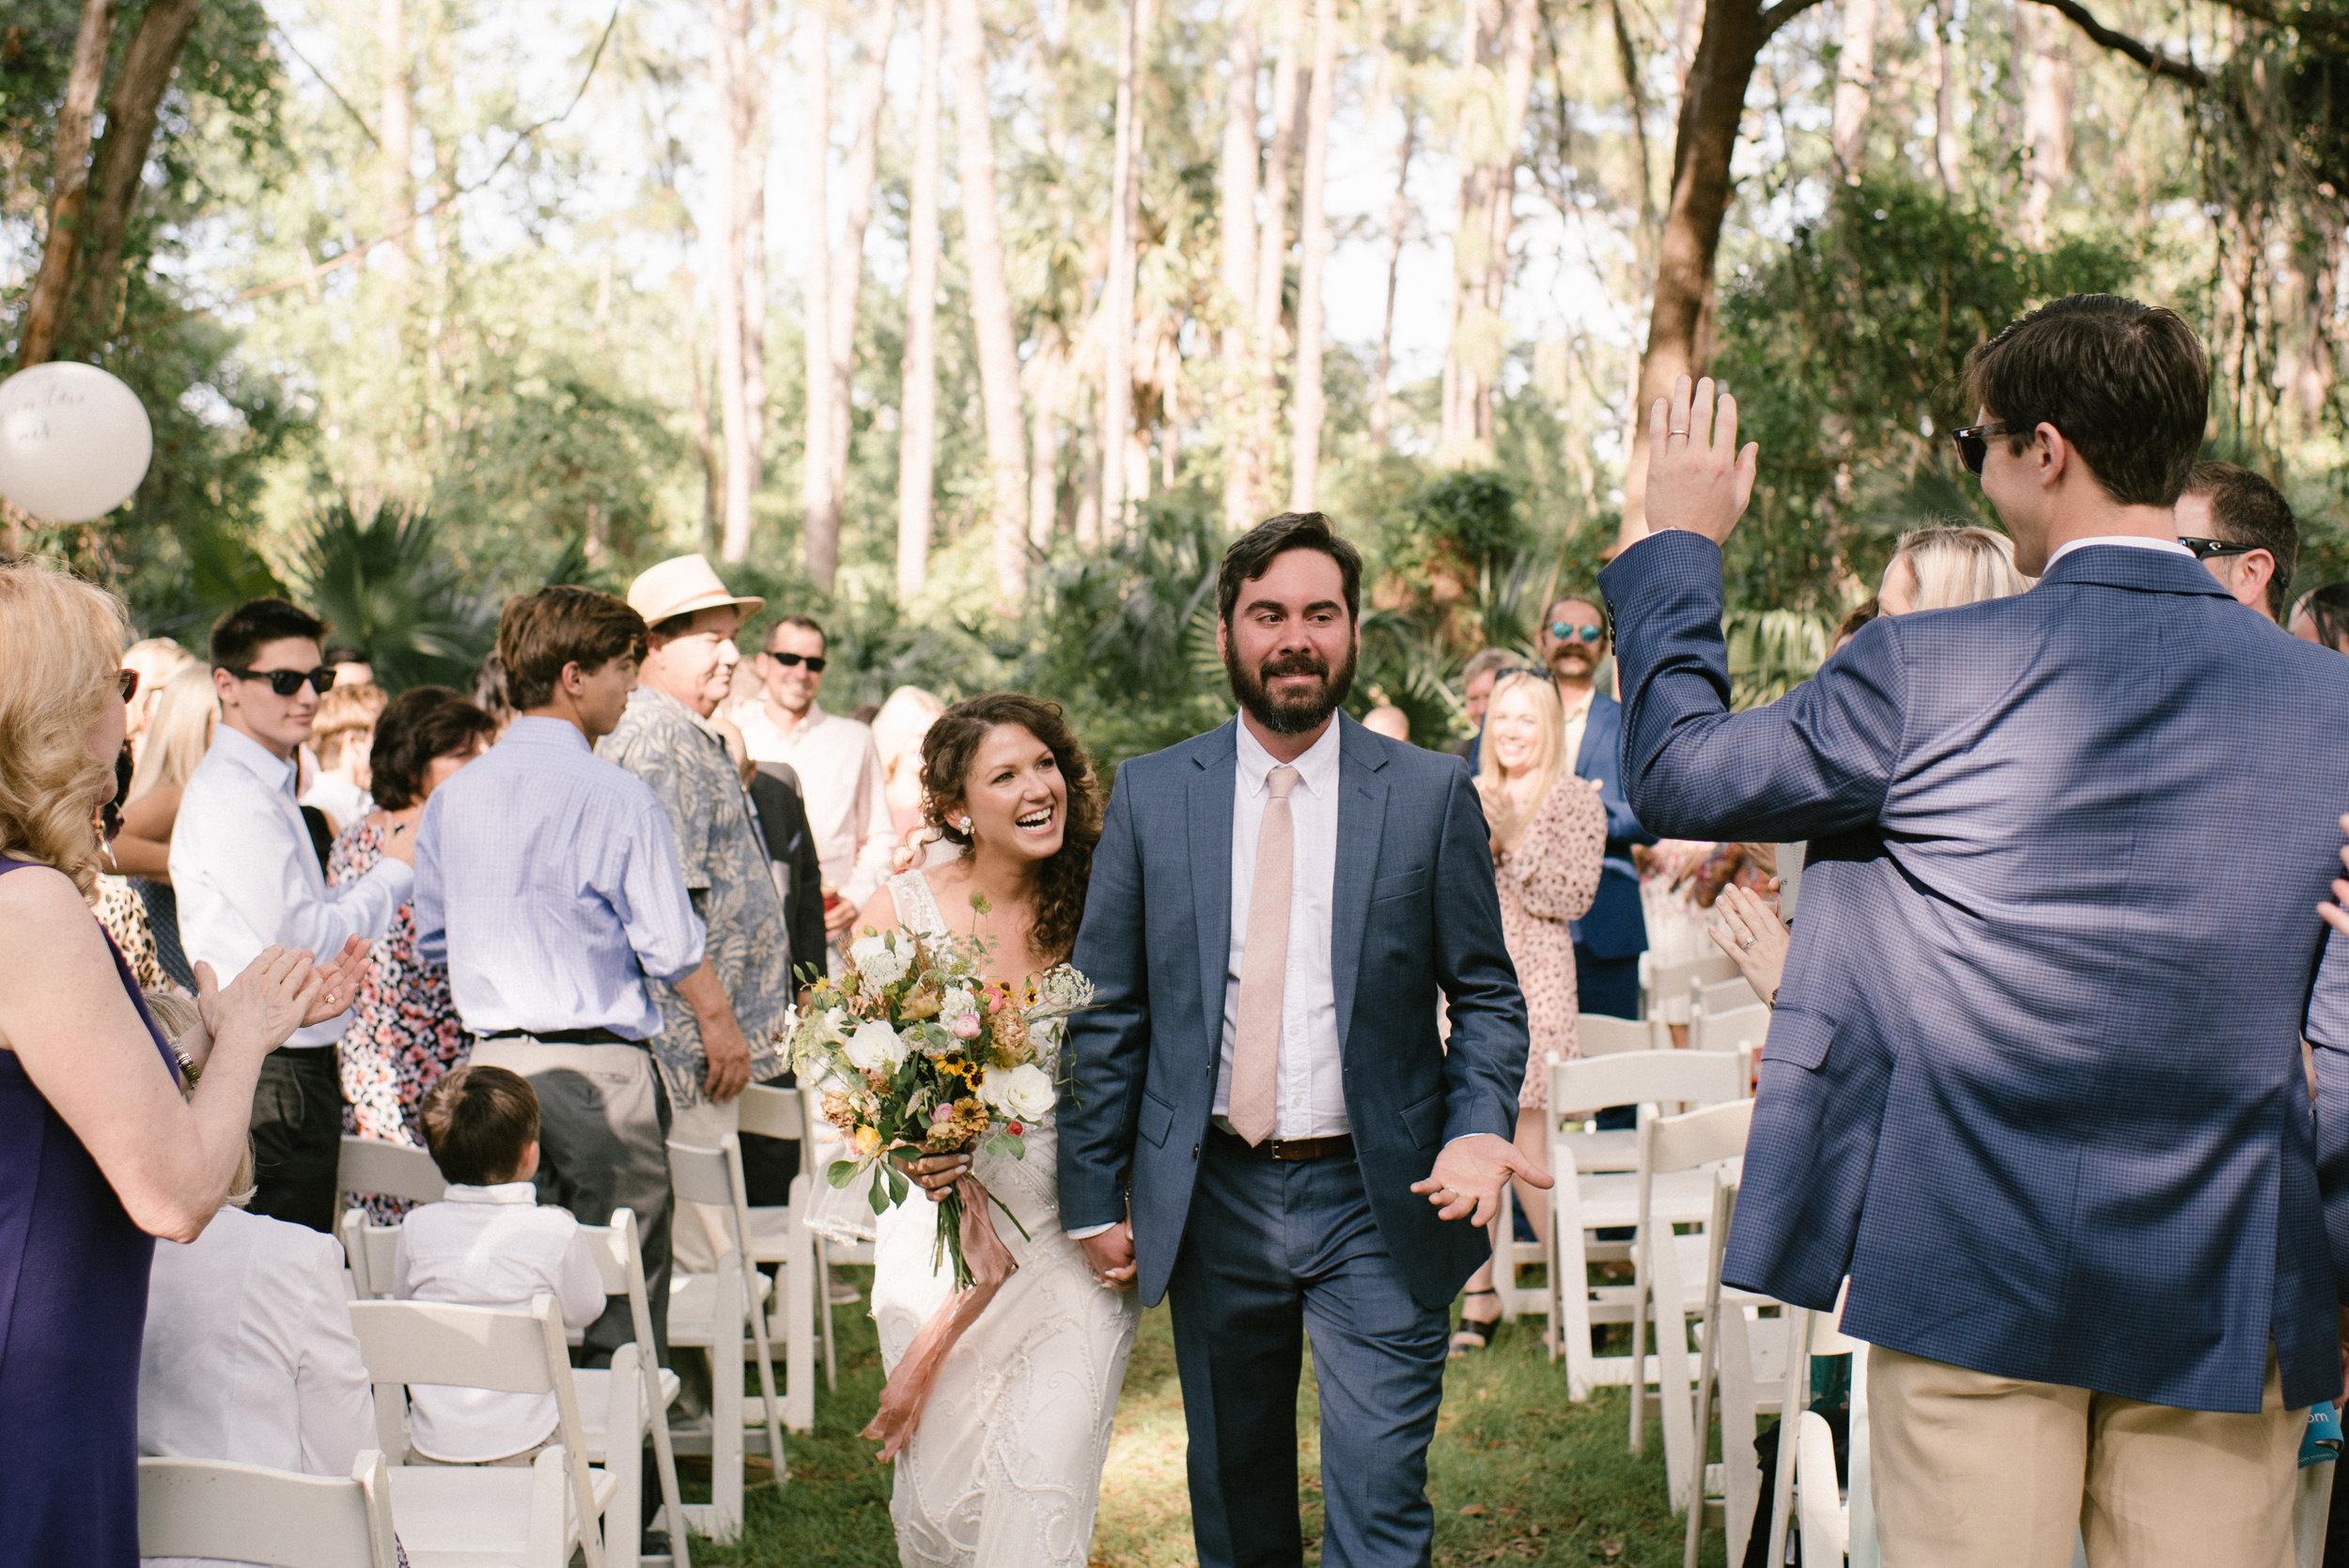 mclaughlin-wedding-538.jpg